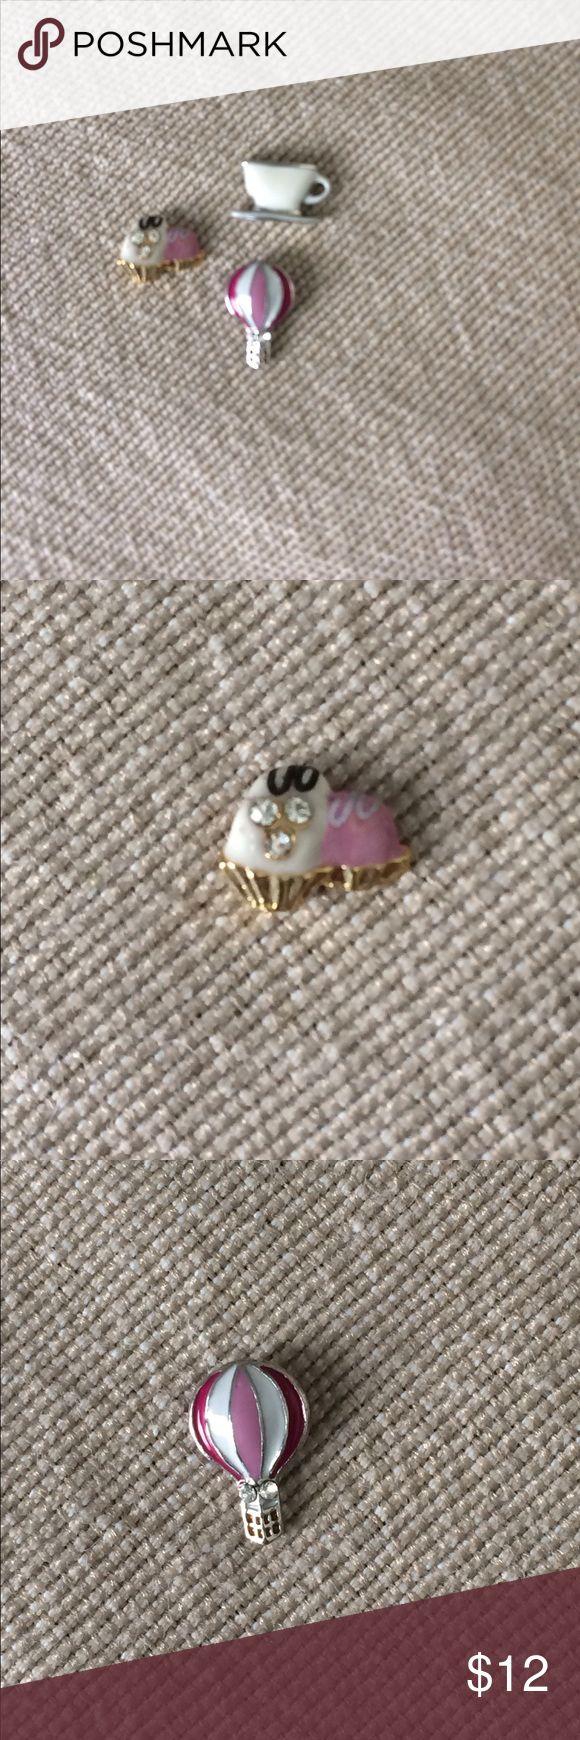 Origami Owl brand charm set Teacup, hot air ballon, cupcakes Origami Owl Jewelry